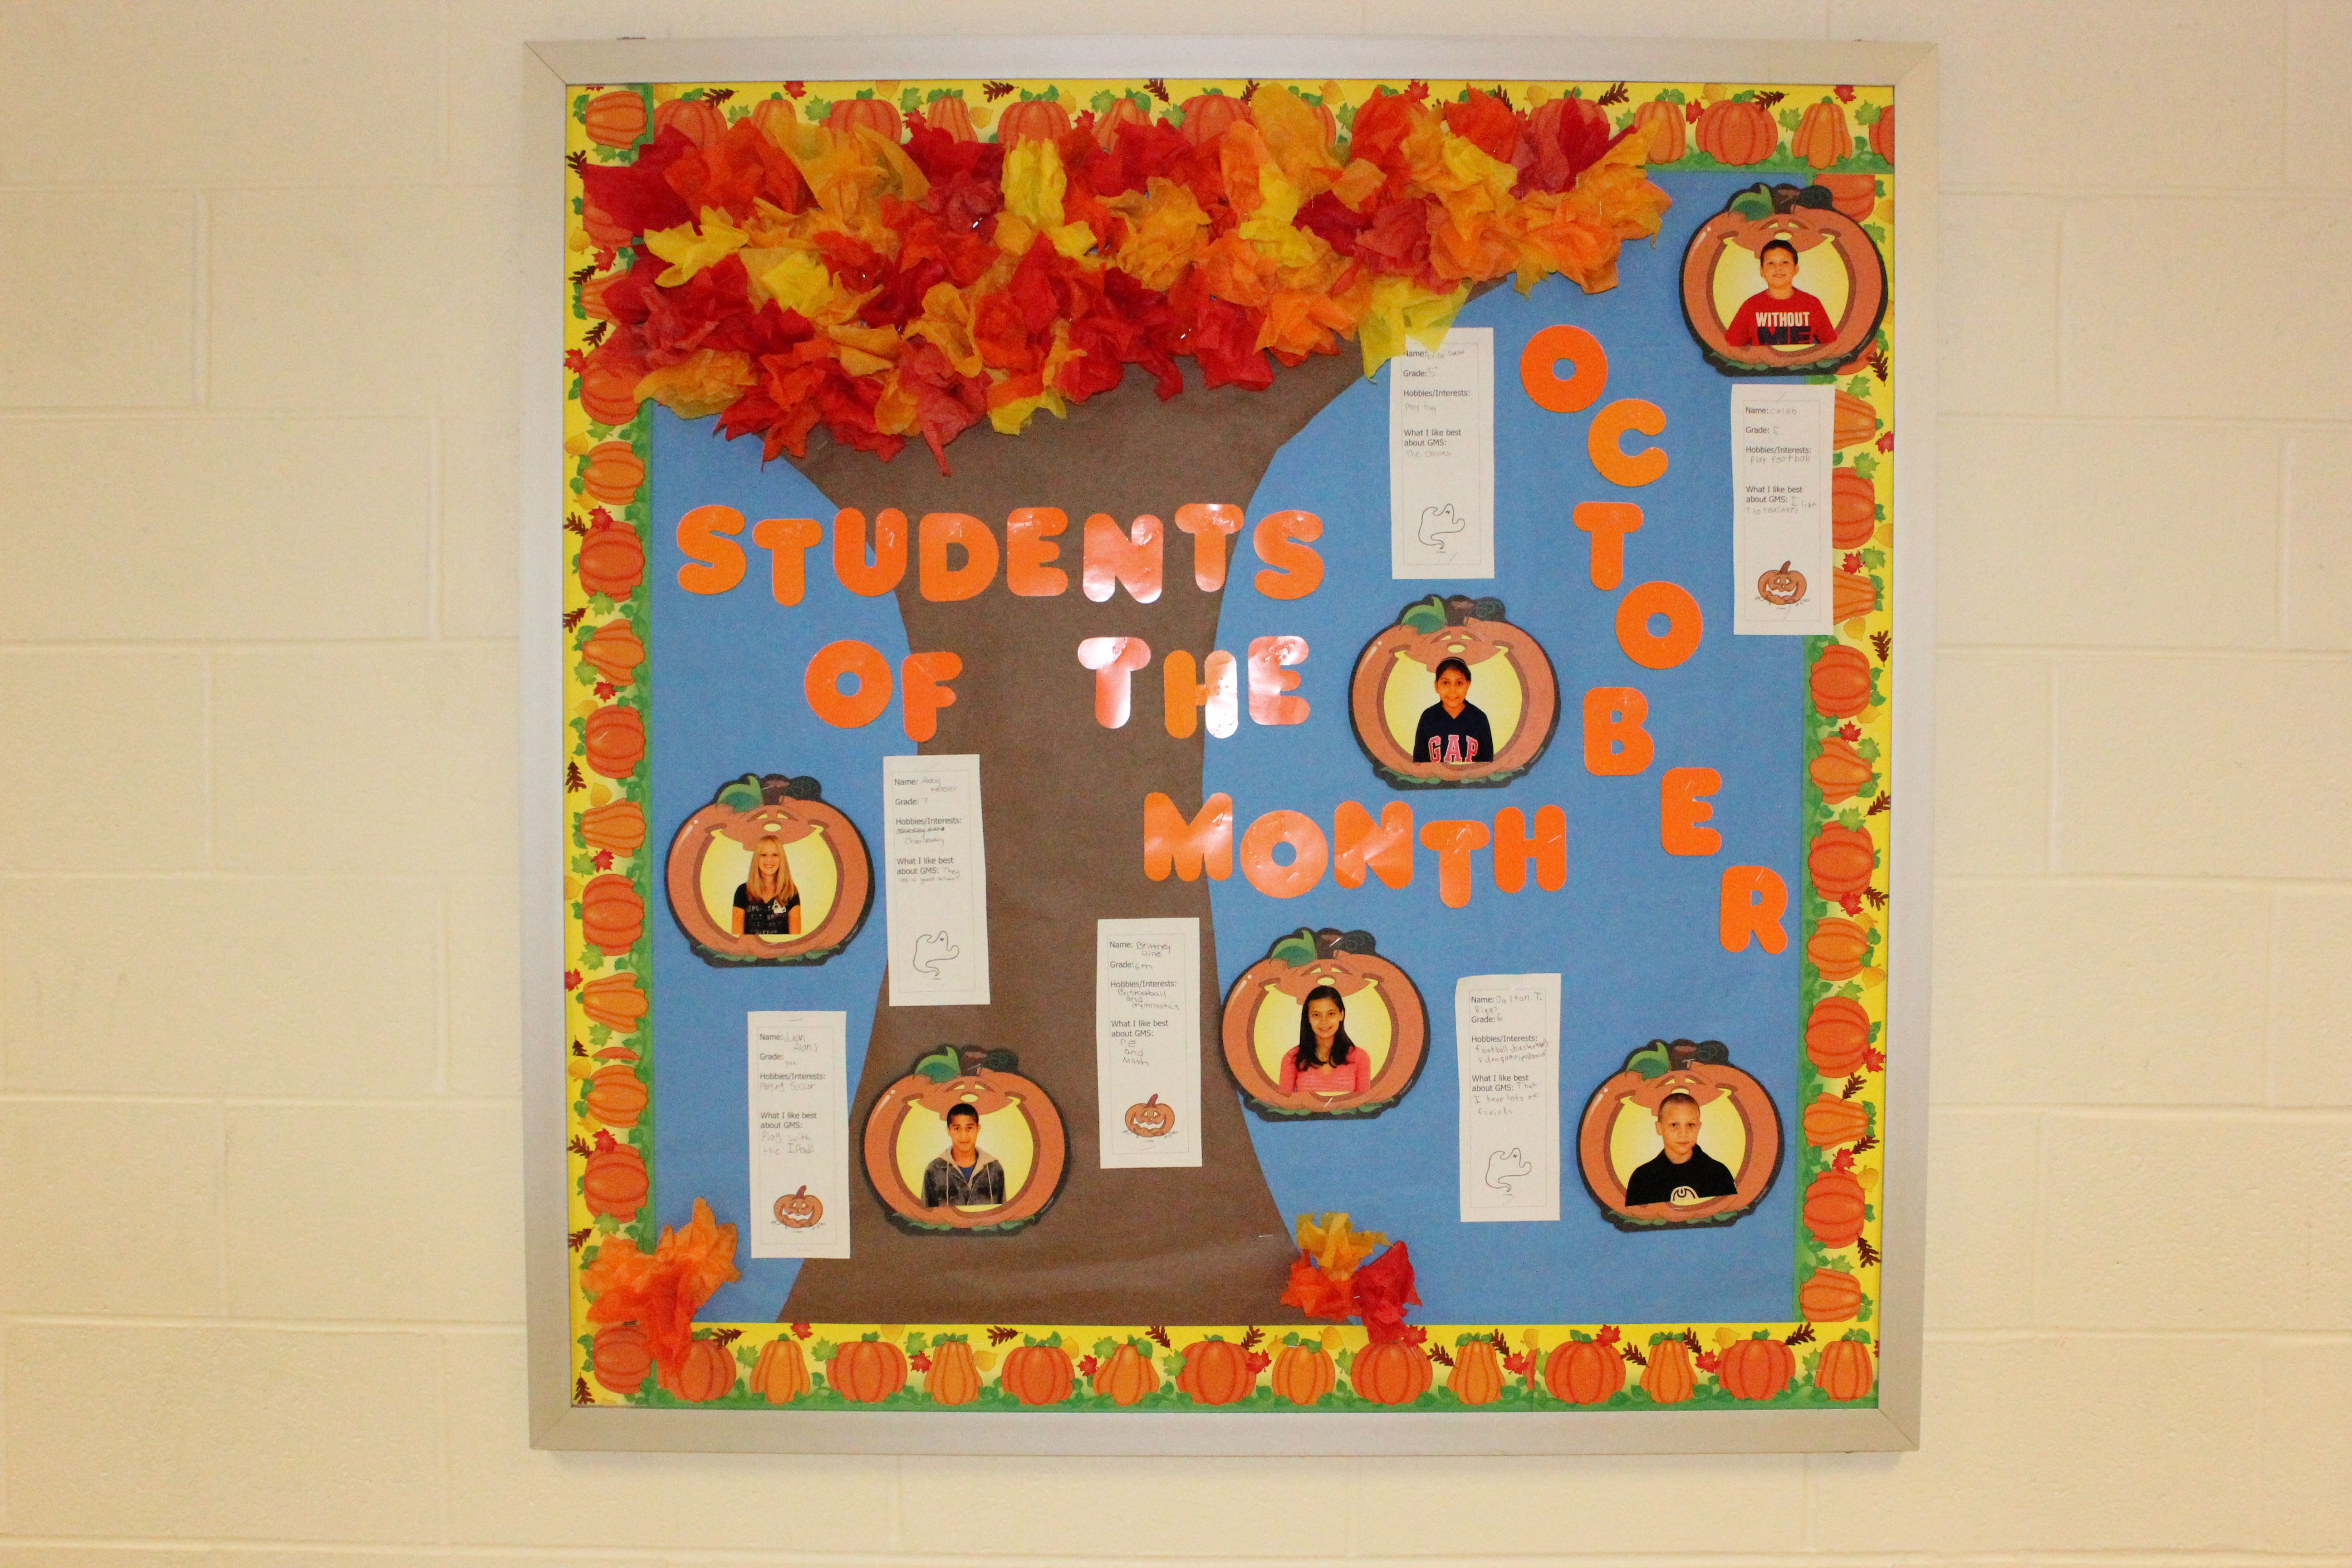 Teacher Resource 12 Gold Medal Olympic Bulletin Board Accents Teaching Supplies Home Garden